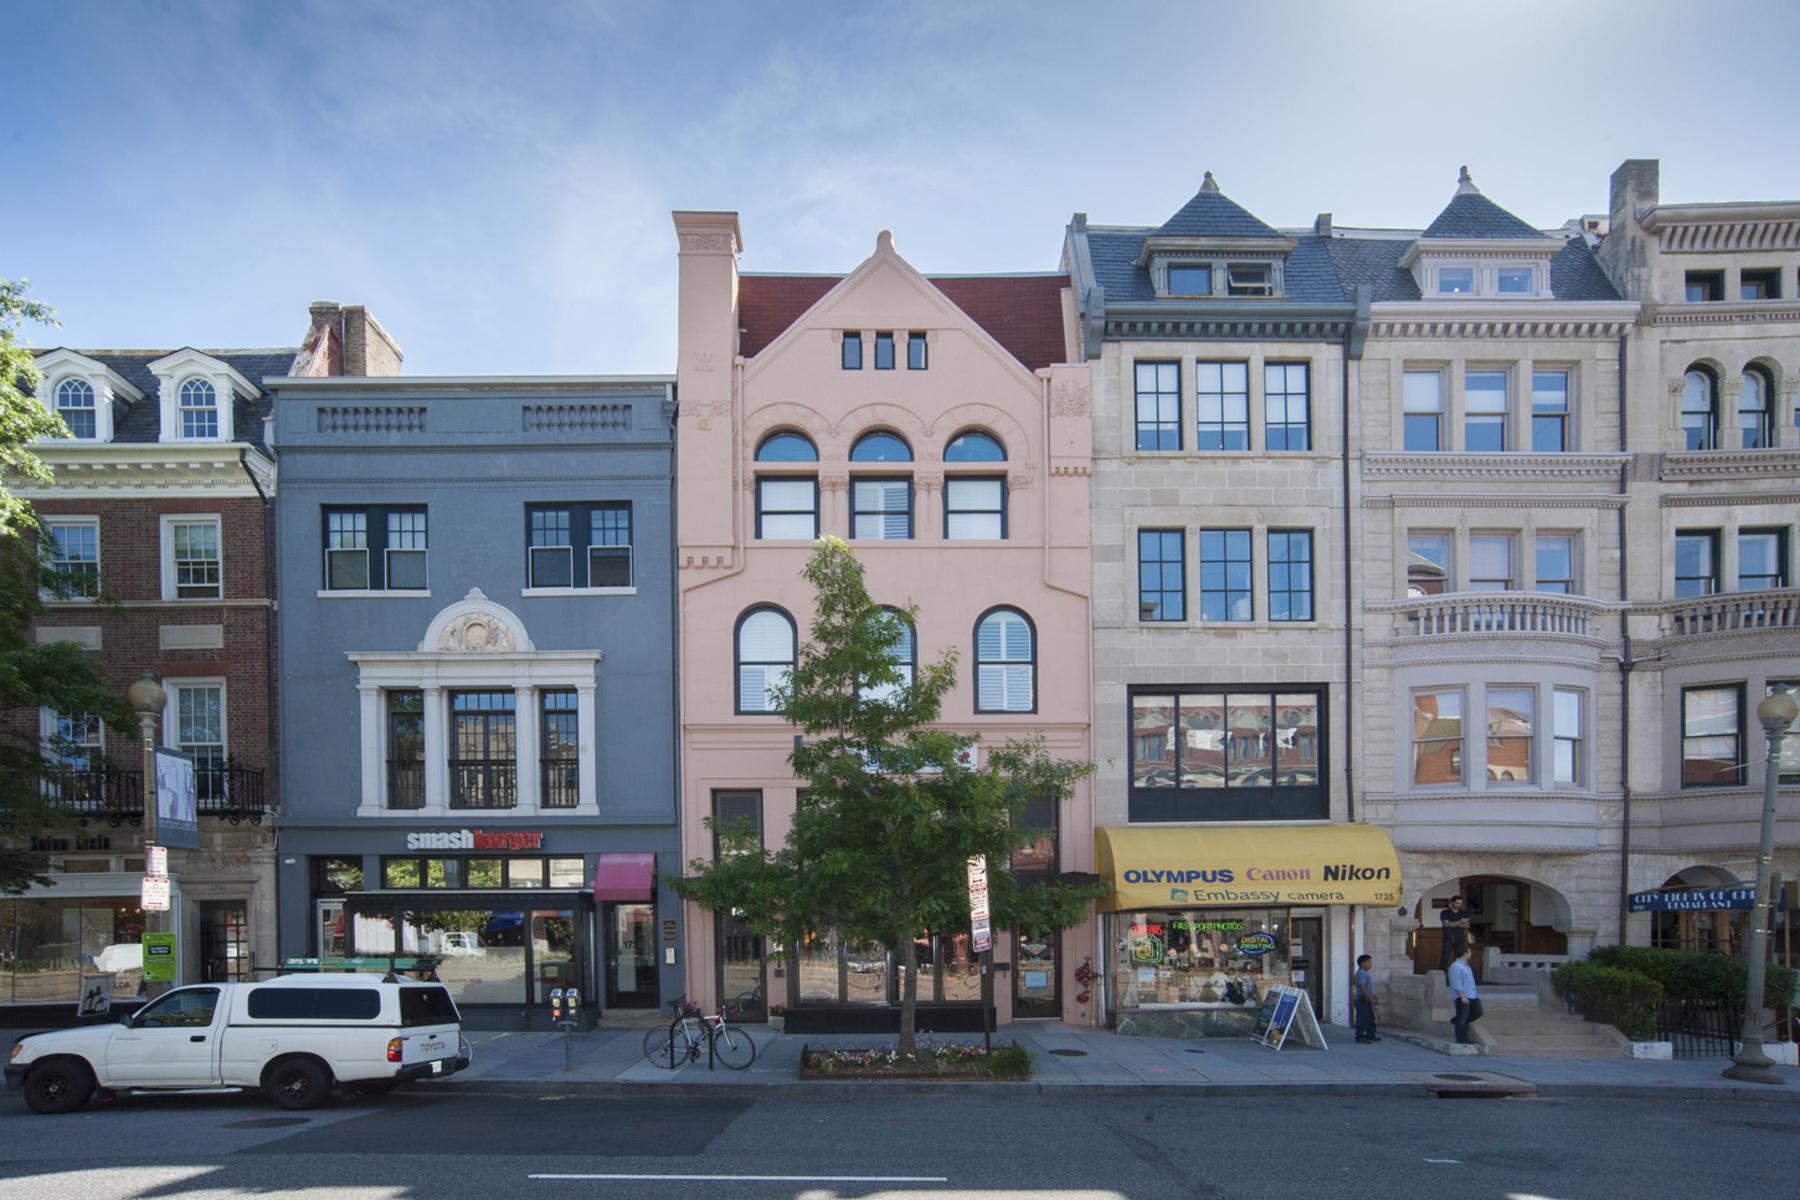 共管式独立产权公寓 为 销售 在 1737 Connecticut Avenue Nw 502, Washington Dupont Circle, Washington, 哥伦比亚特区 20009 美国